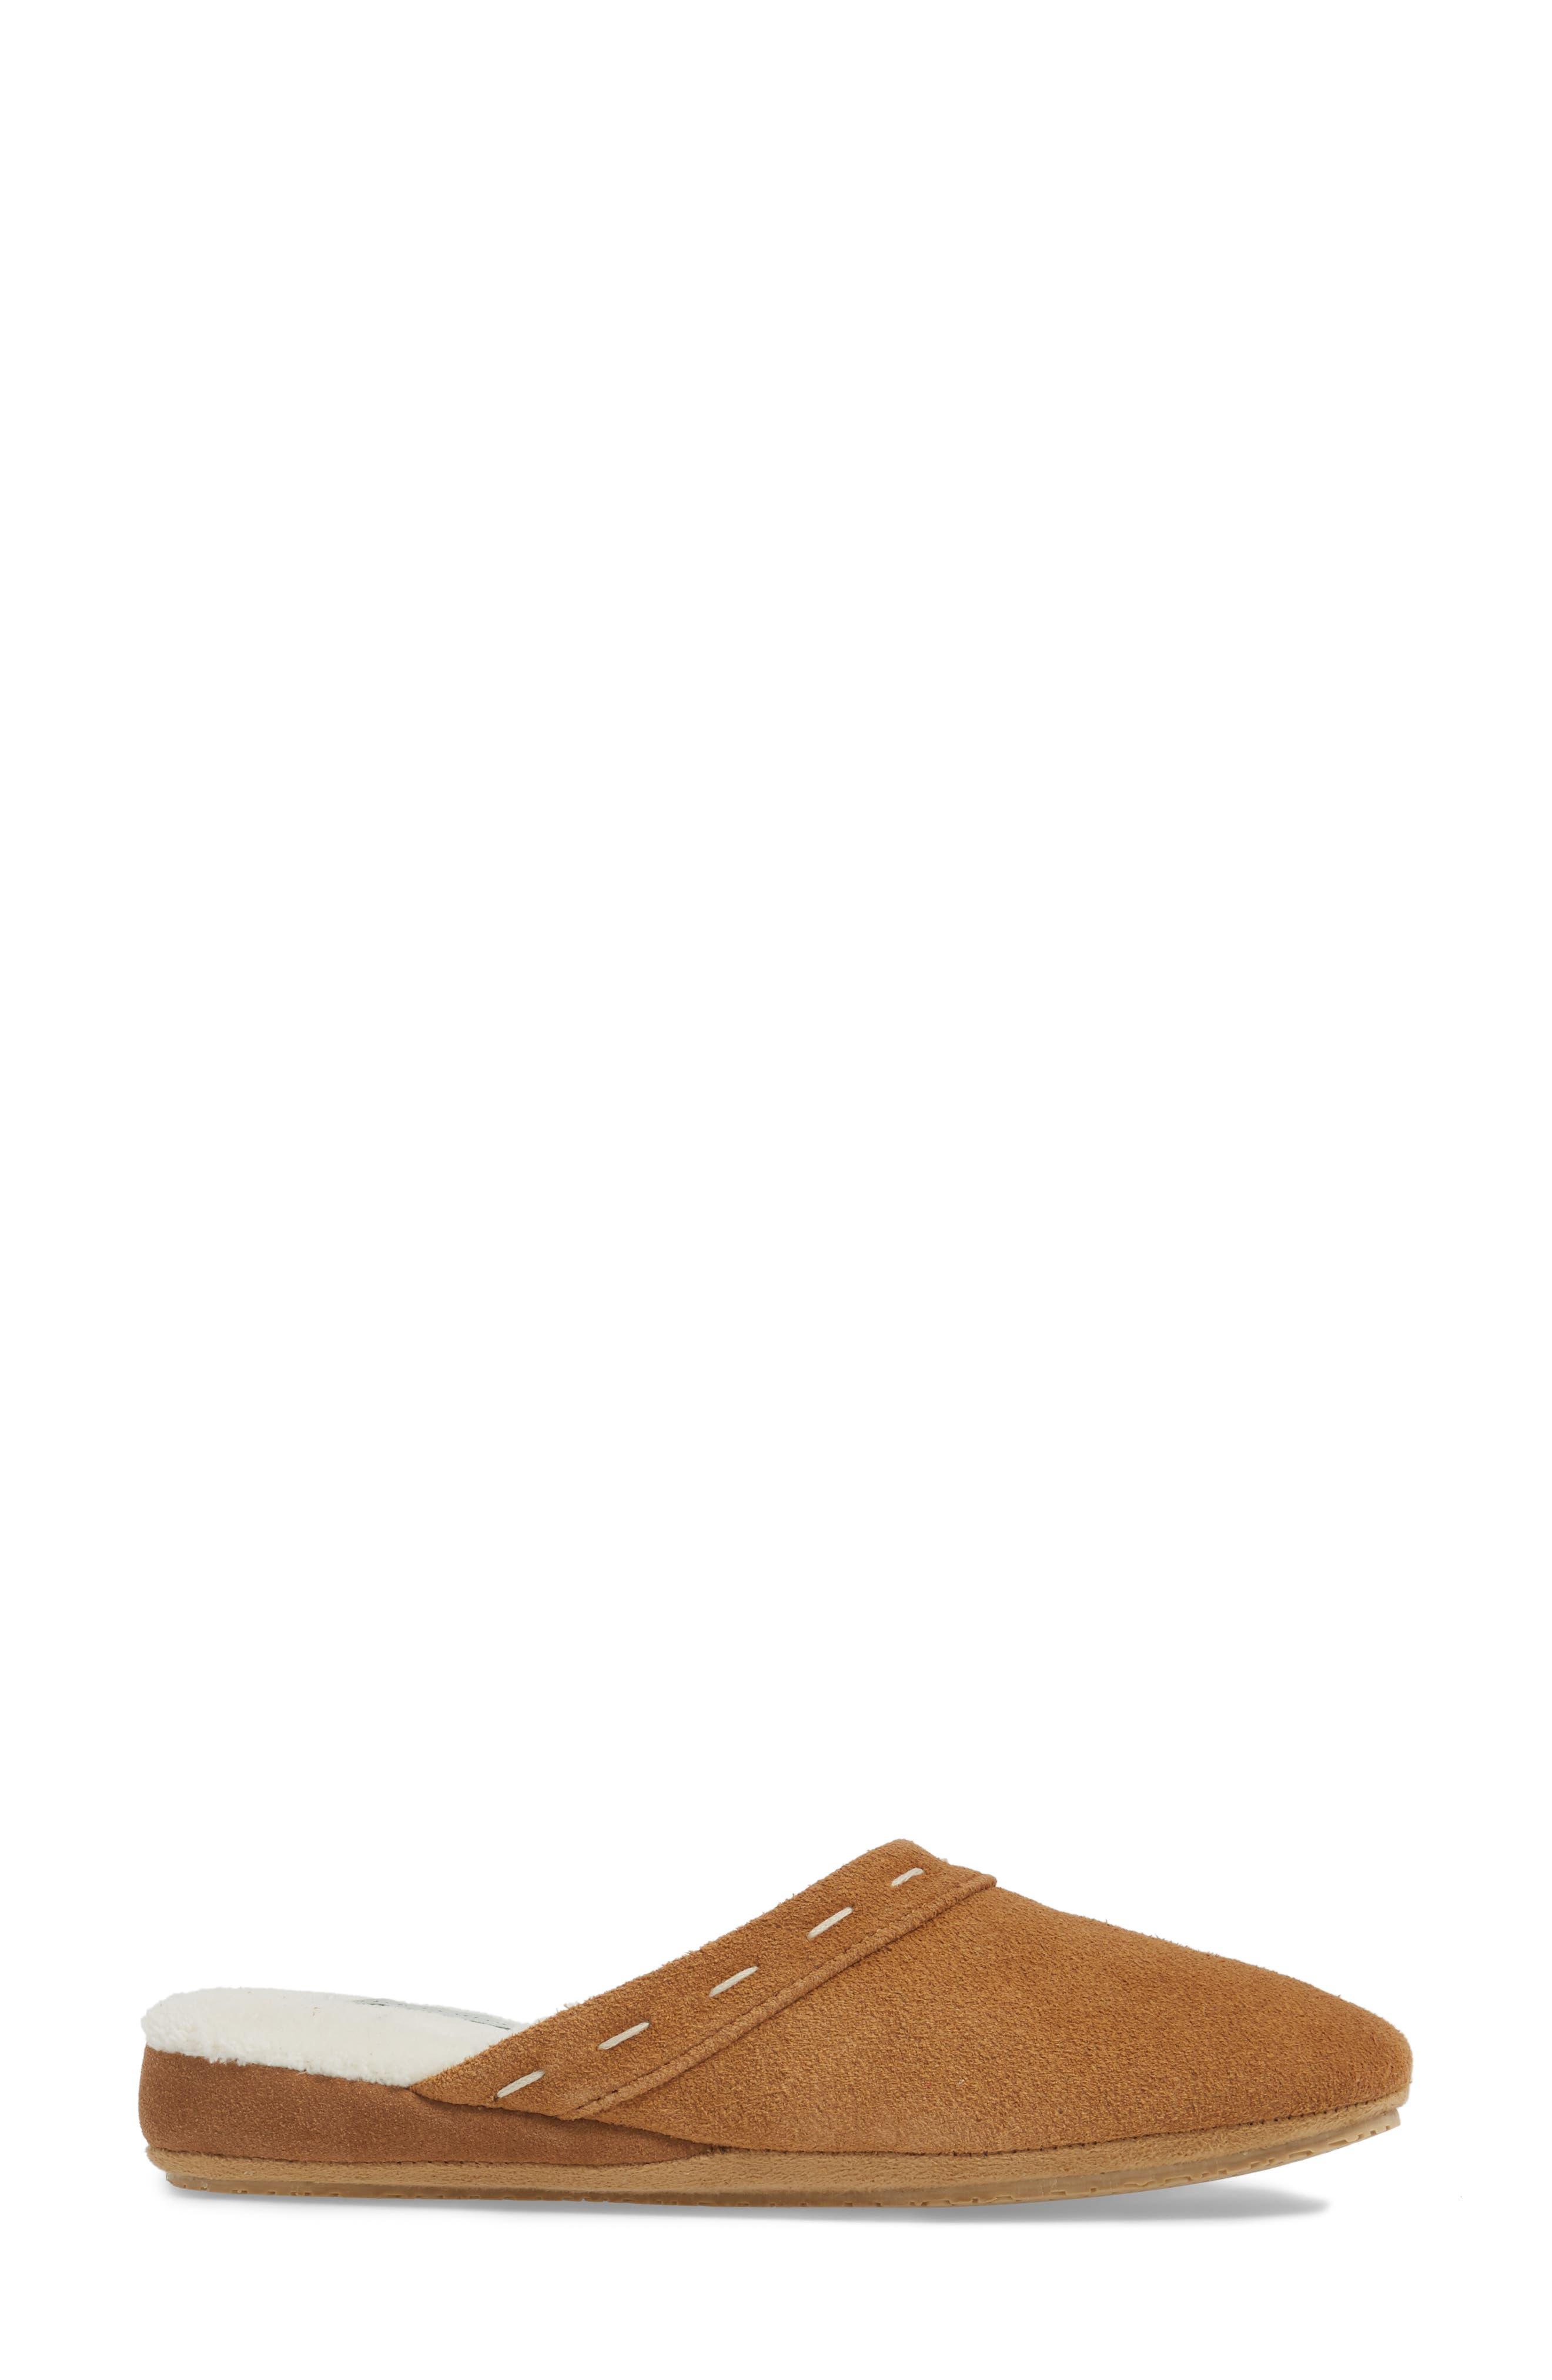 Mayfair Wedge Slipper,                             Alternate thumbnail 3, color,                             CAMEL SUEDE